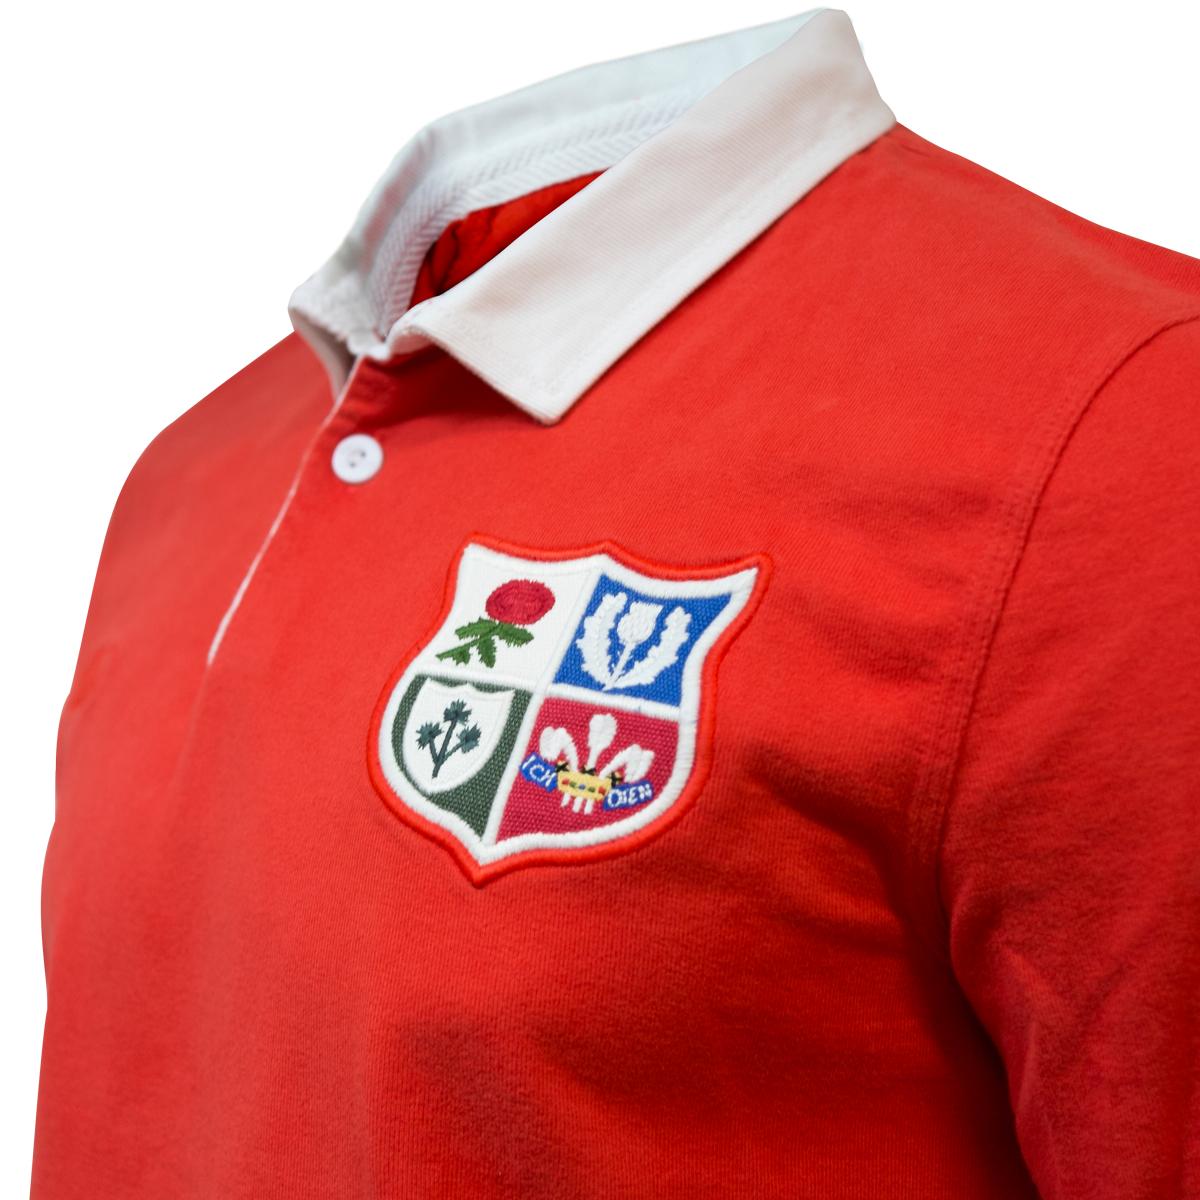 British Lions Tour  Shirt